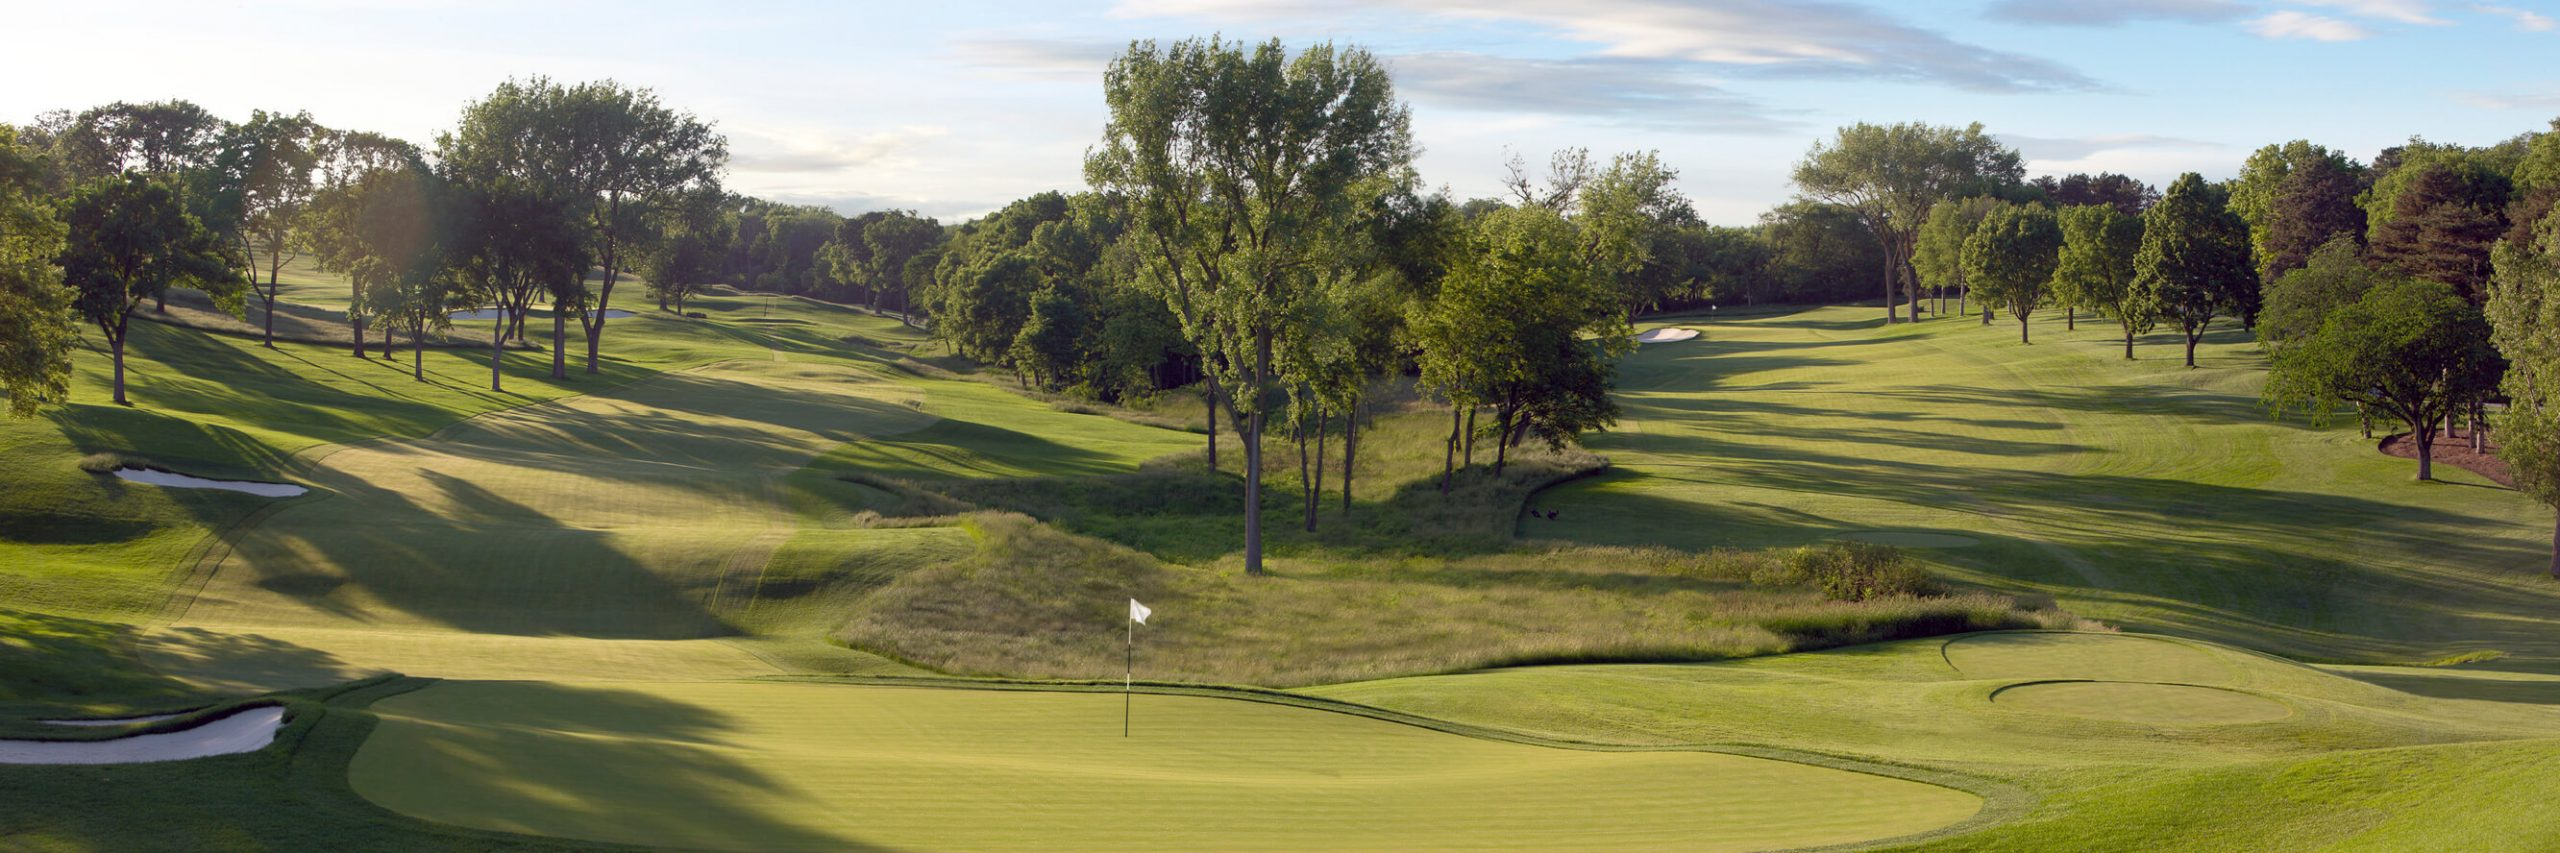 Golf Course Image - Omaha Country Club No. 16-12